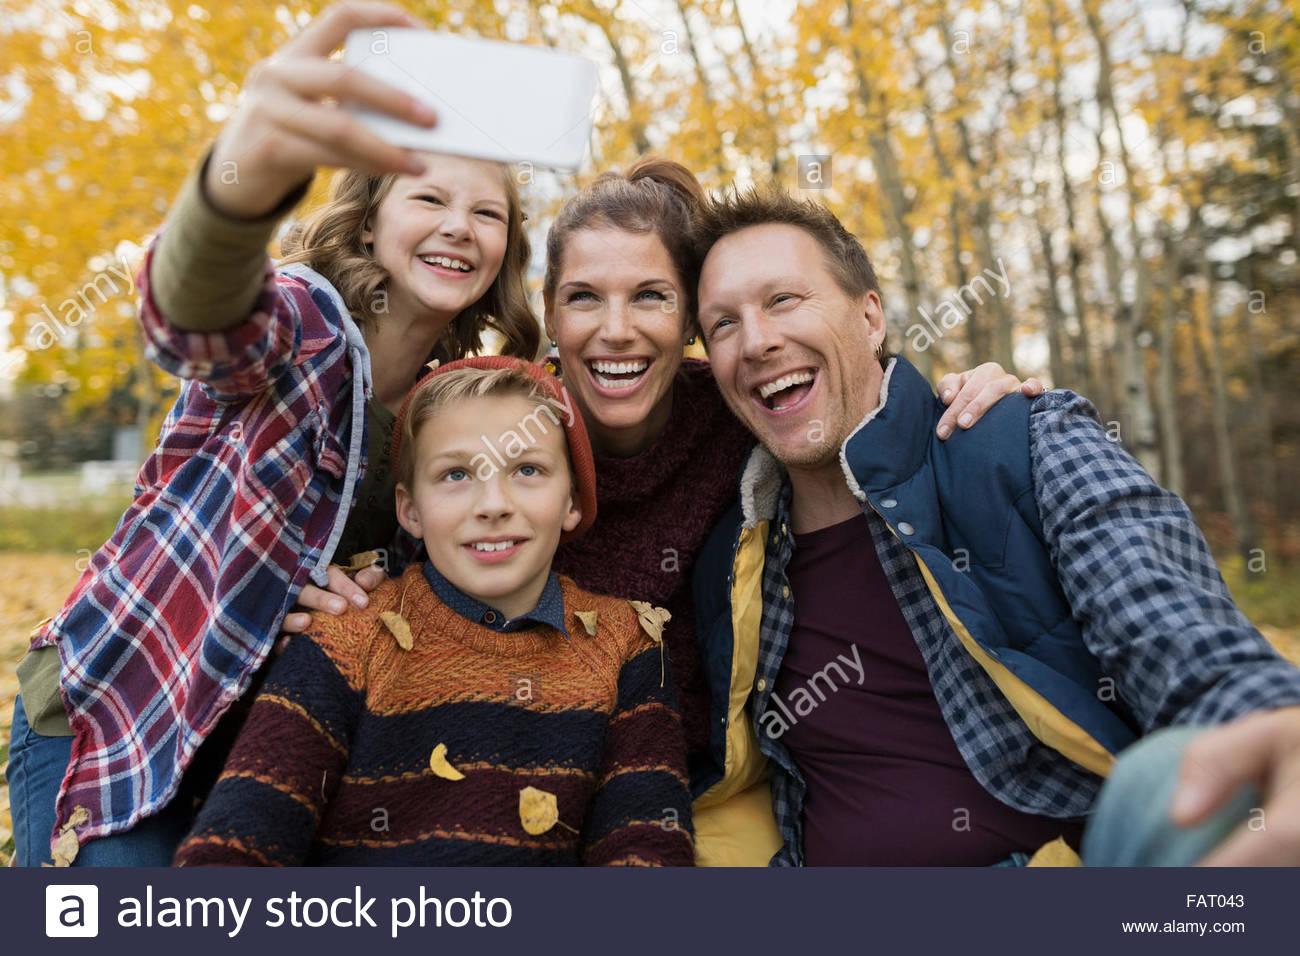 Family taking selfie in autumn park - Stock Image